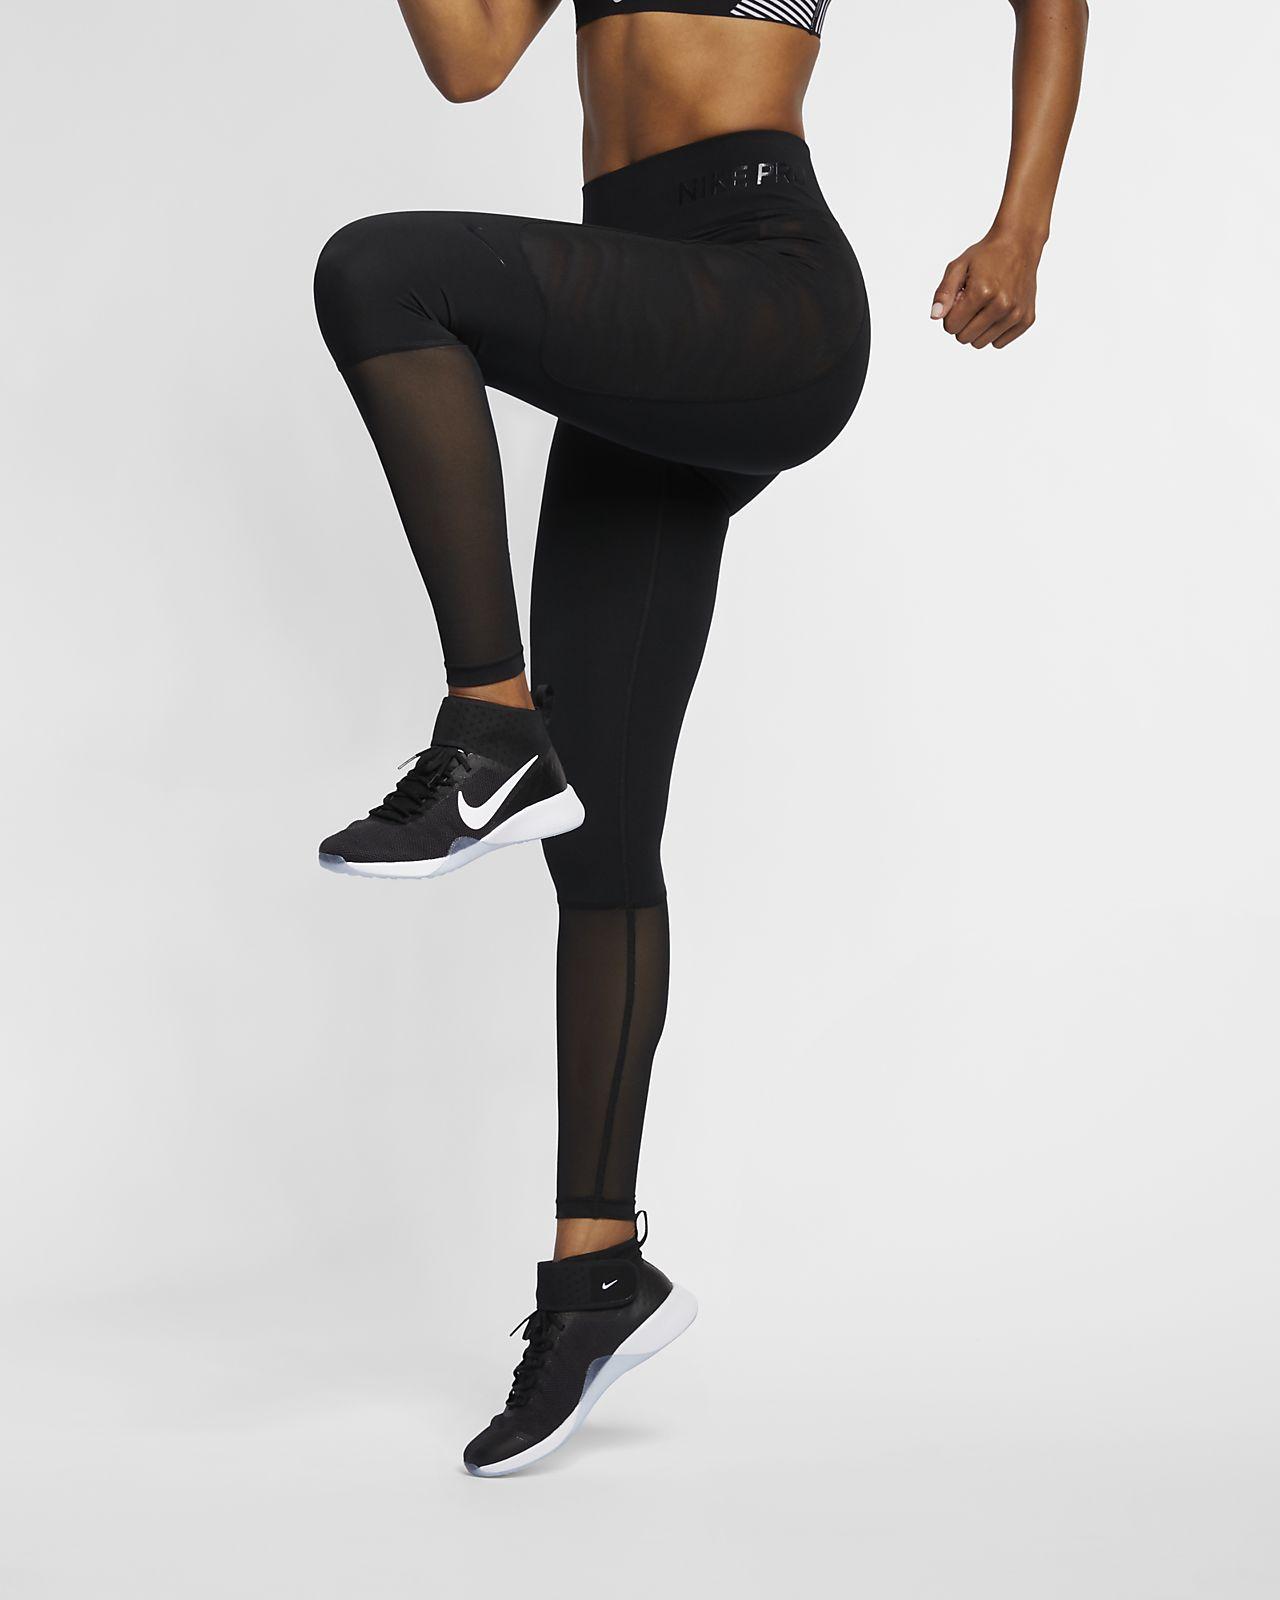 Женские тайтсы Nike Pro HyperCool